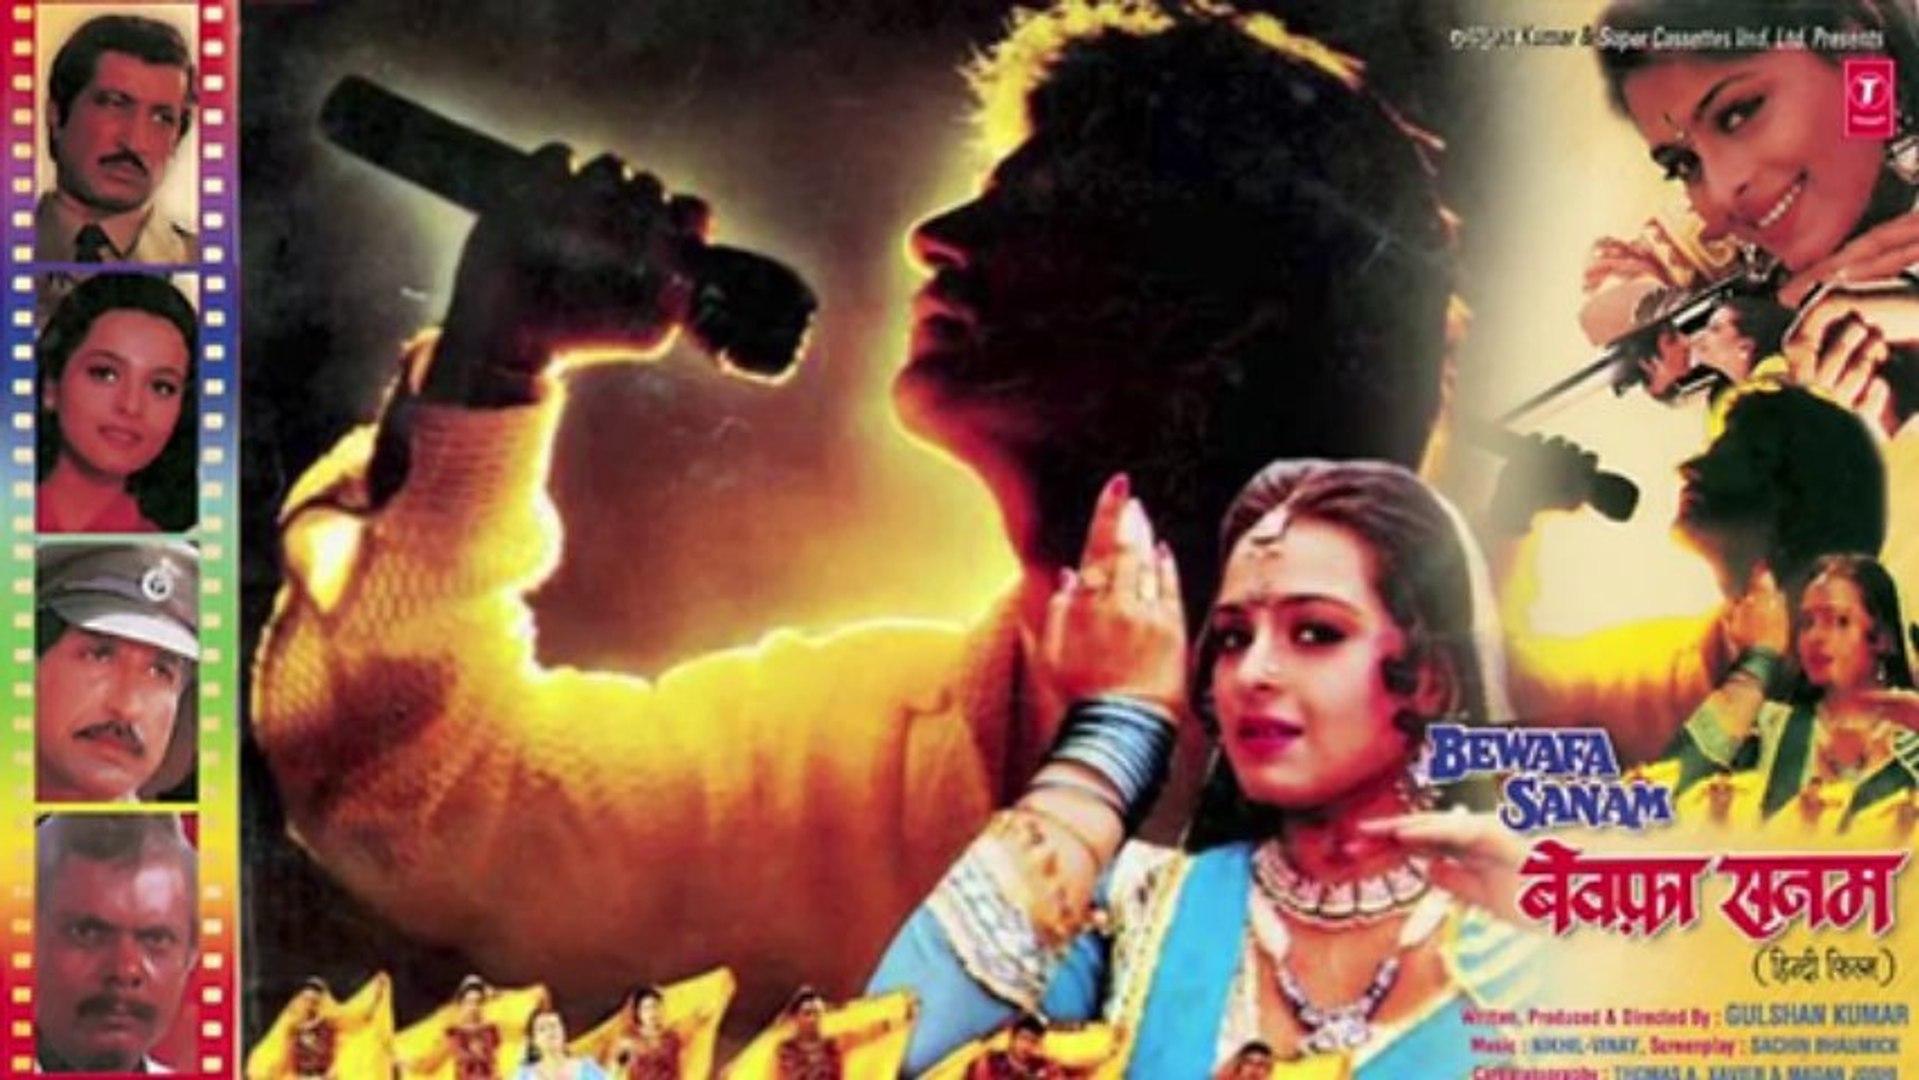 Wafa Na Raas Aayee Full Song (Instrumental) _ Bewafa Sanam _ Krishan Kumar,  Shilpa Shirodkar - video dailymotion